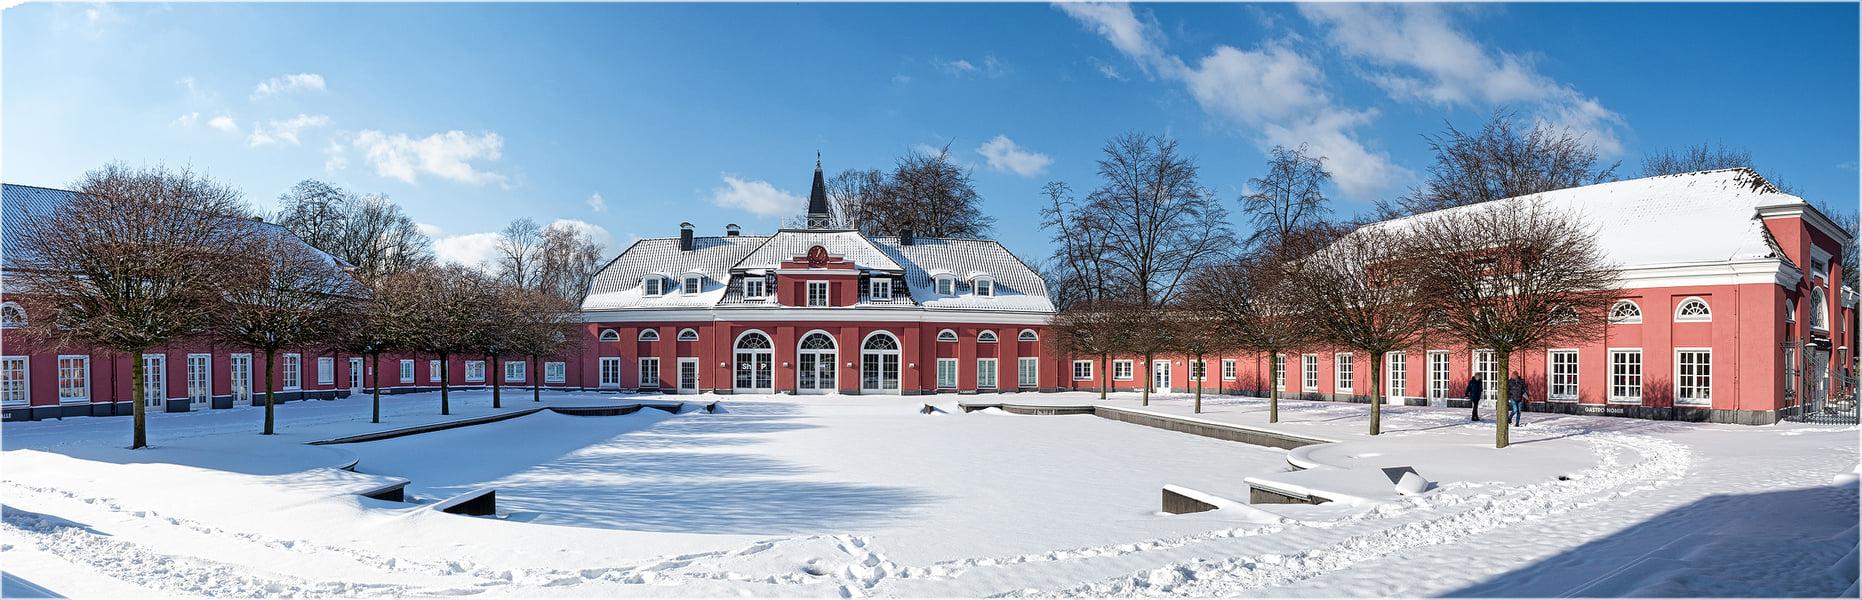 Standesamt Schloss Oberhausen